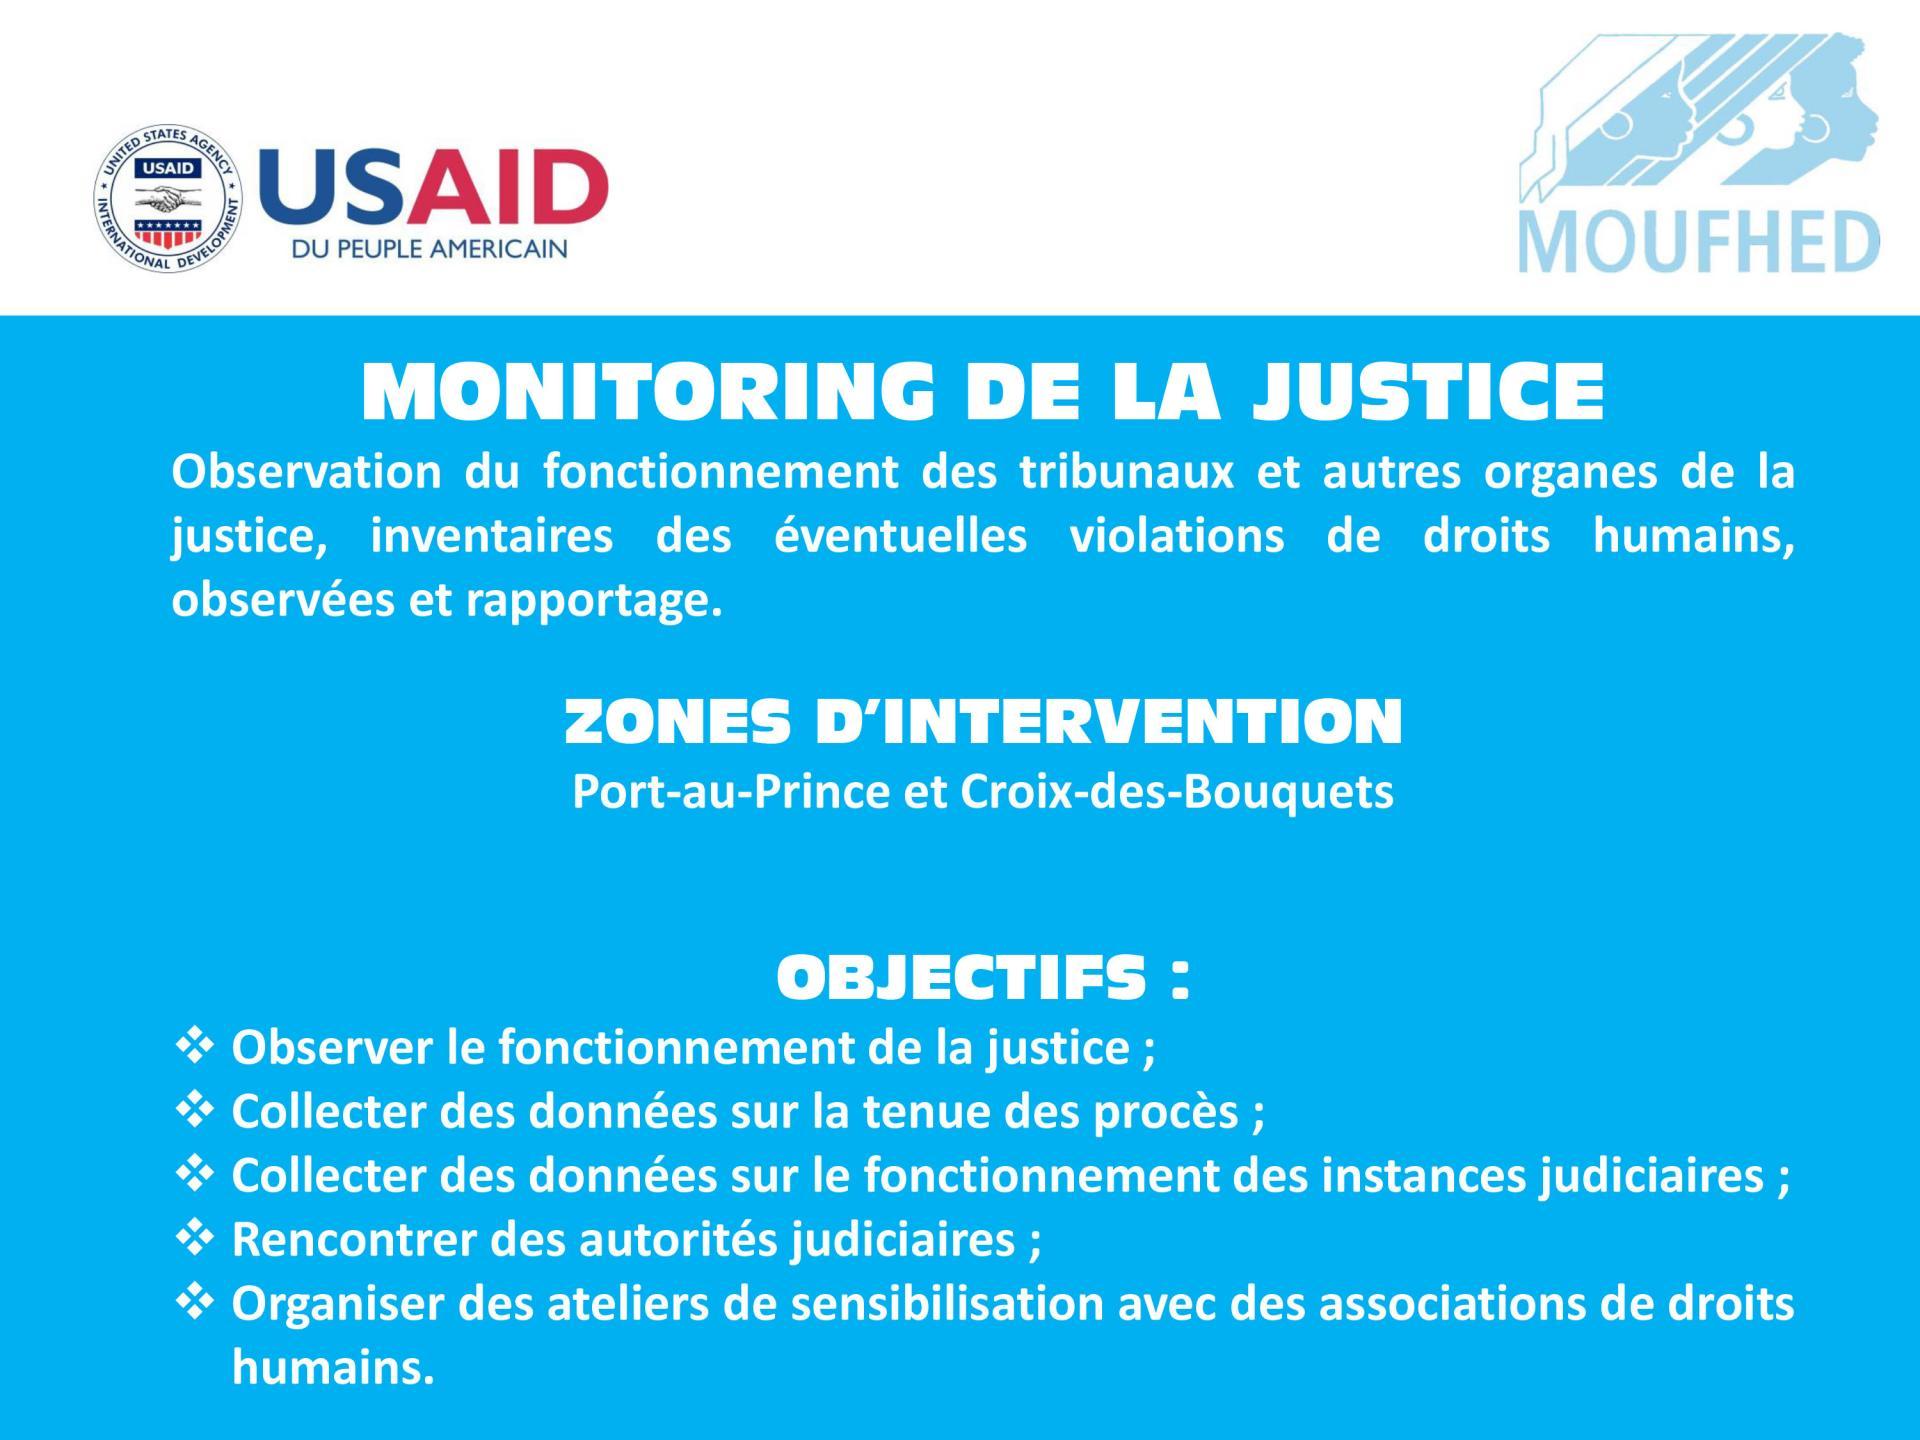 JSSP USAID